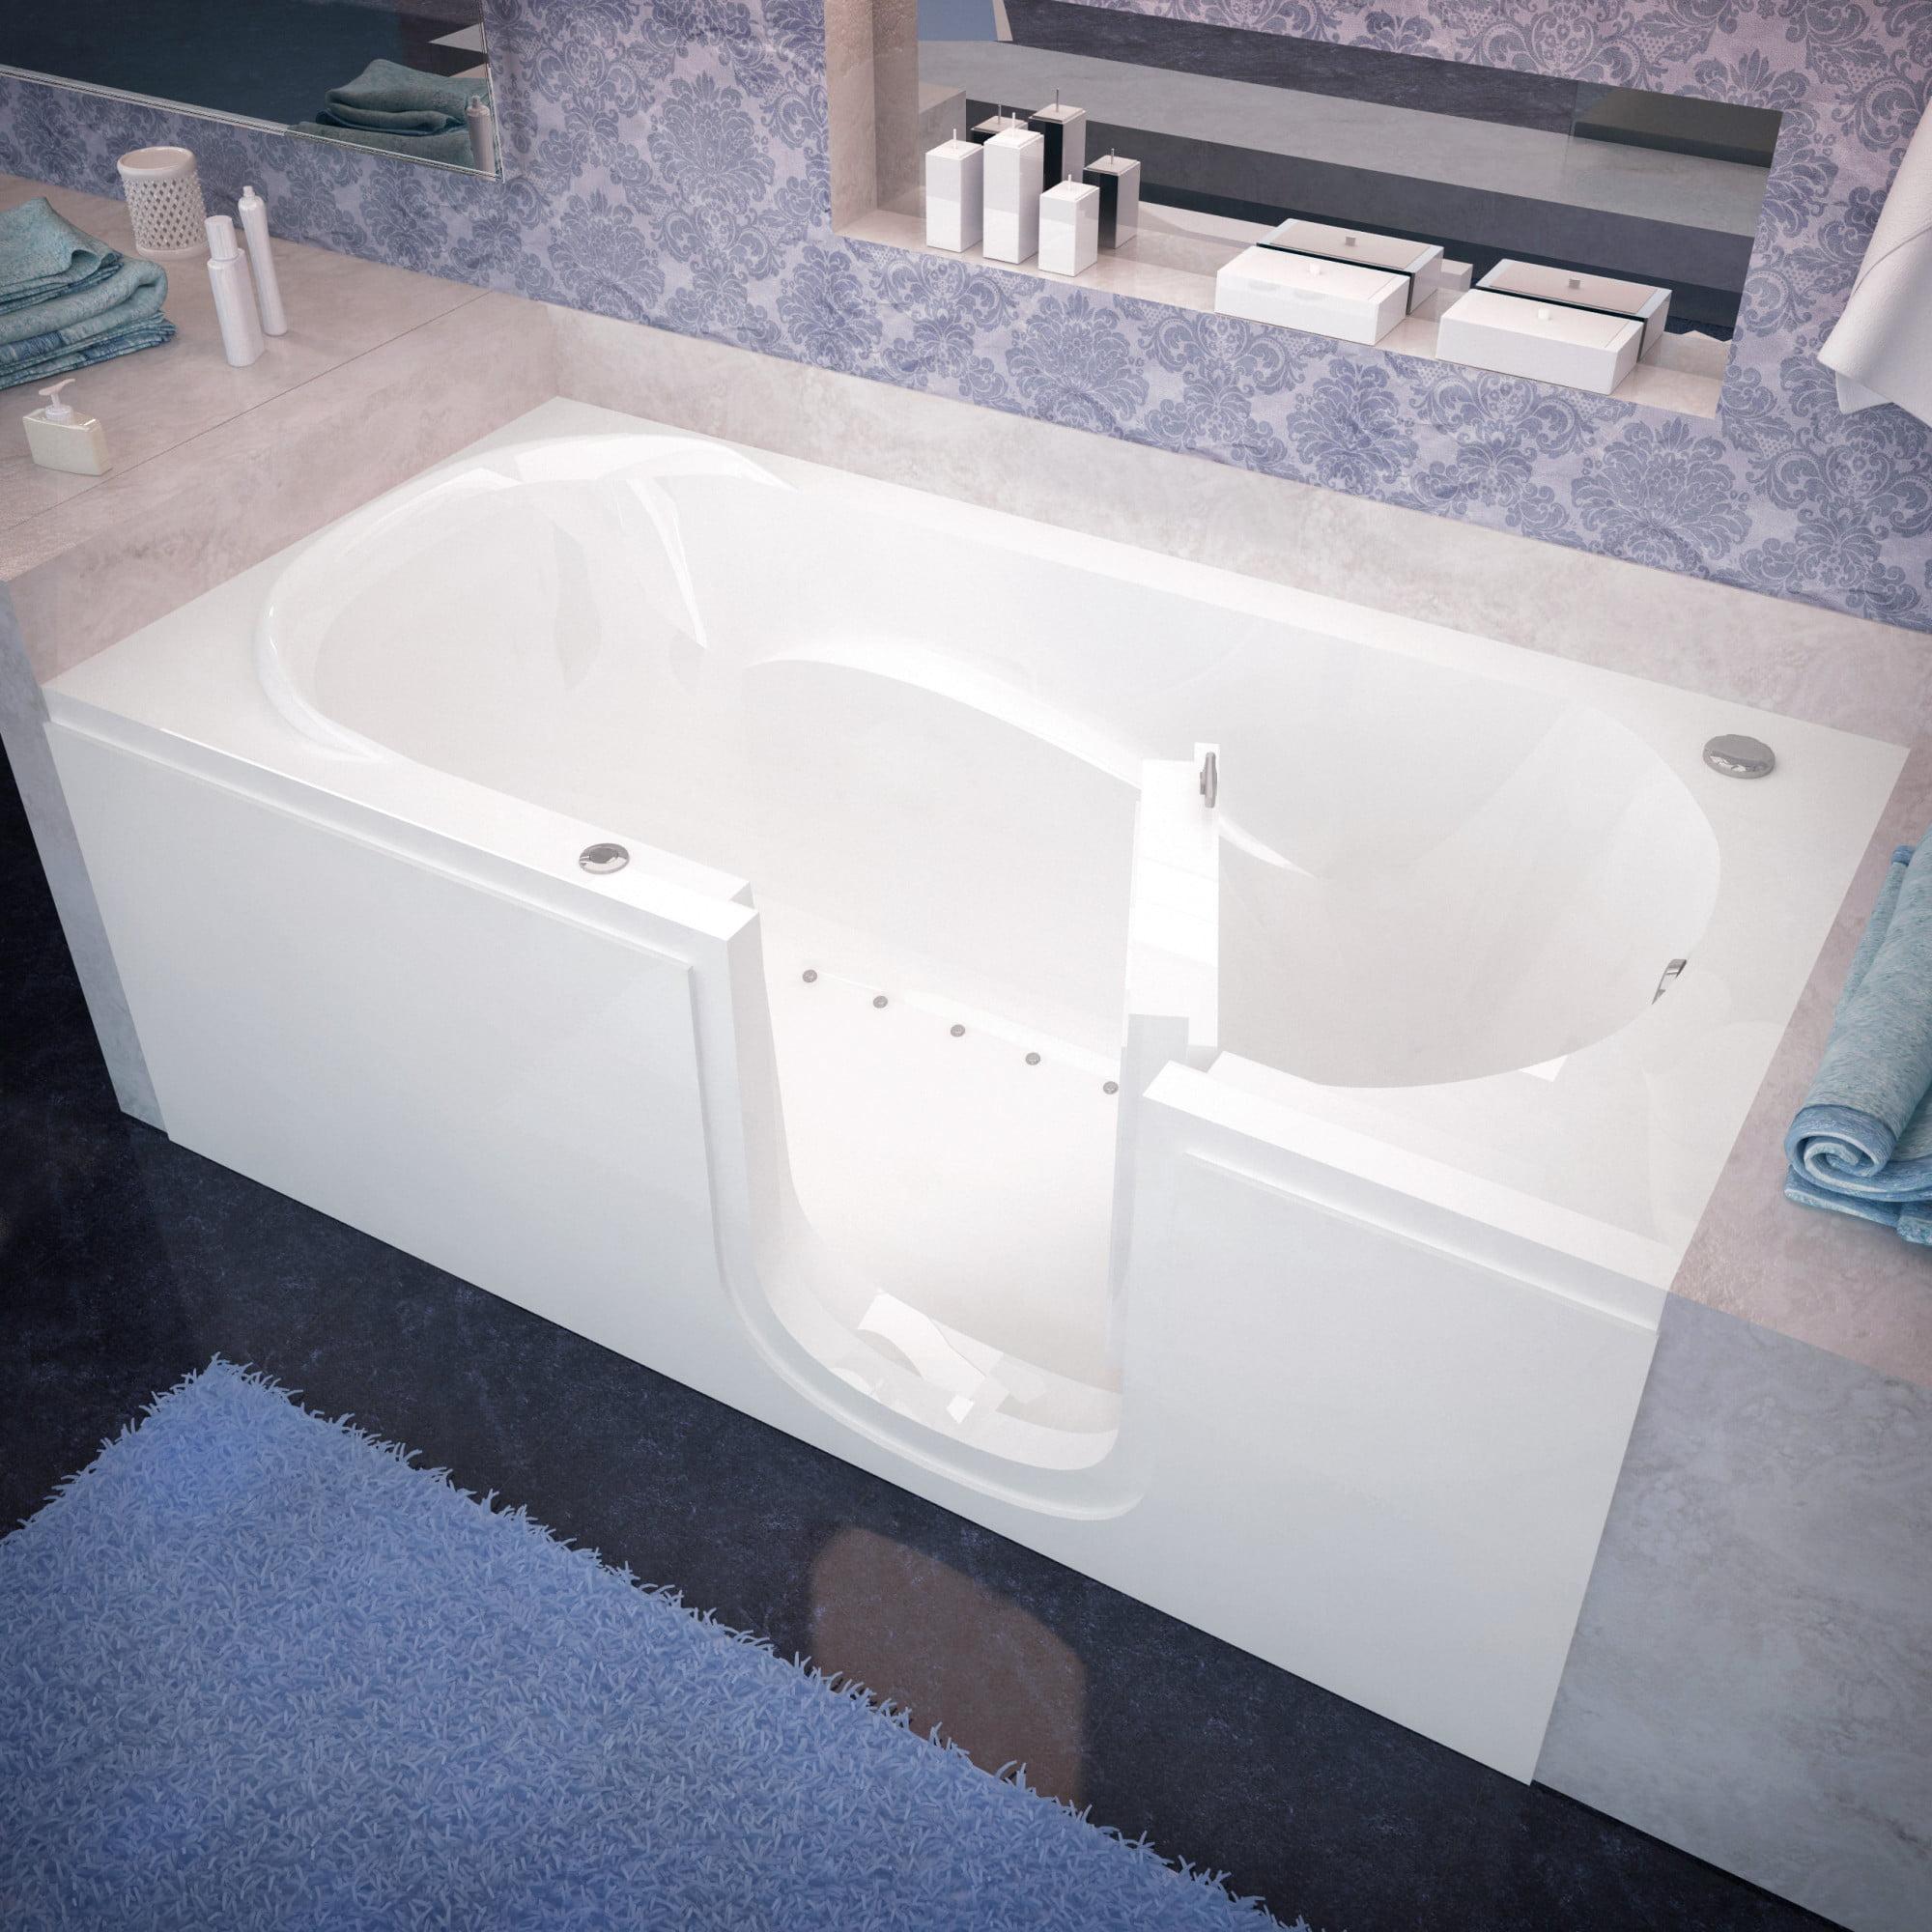 "Avano AV3060SIRA Step-In Tubs 59-5/8"" Acrylic Air Bathtub for Alcove Installations with Right Drain"